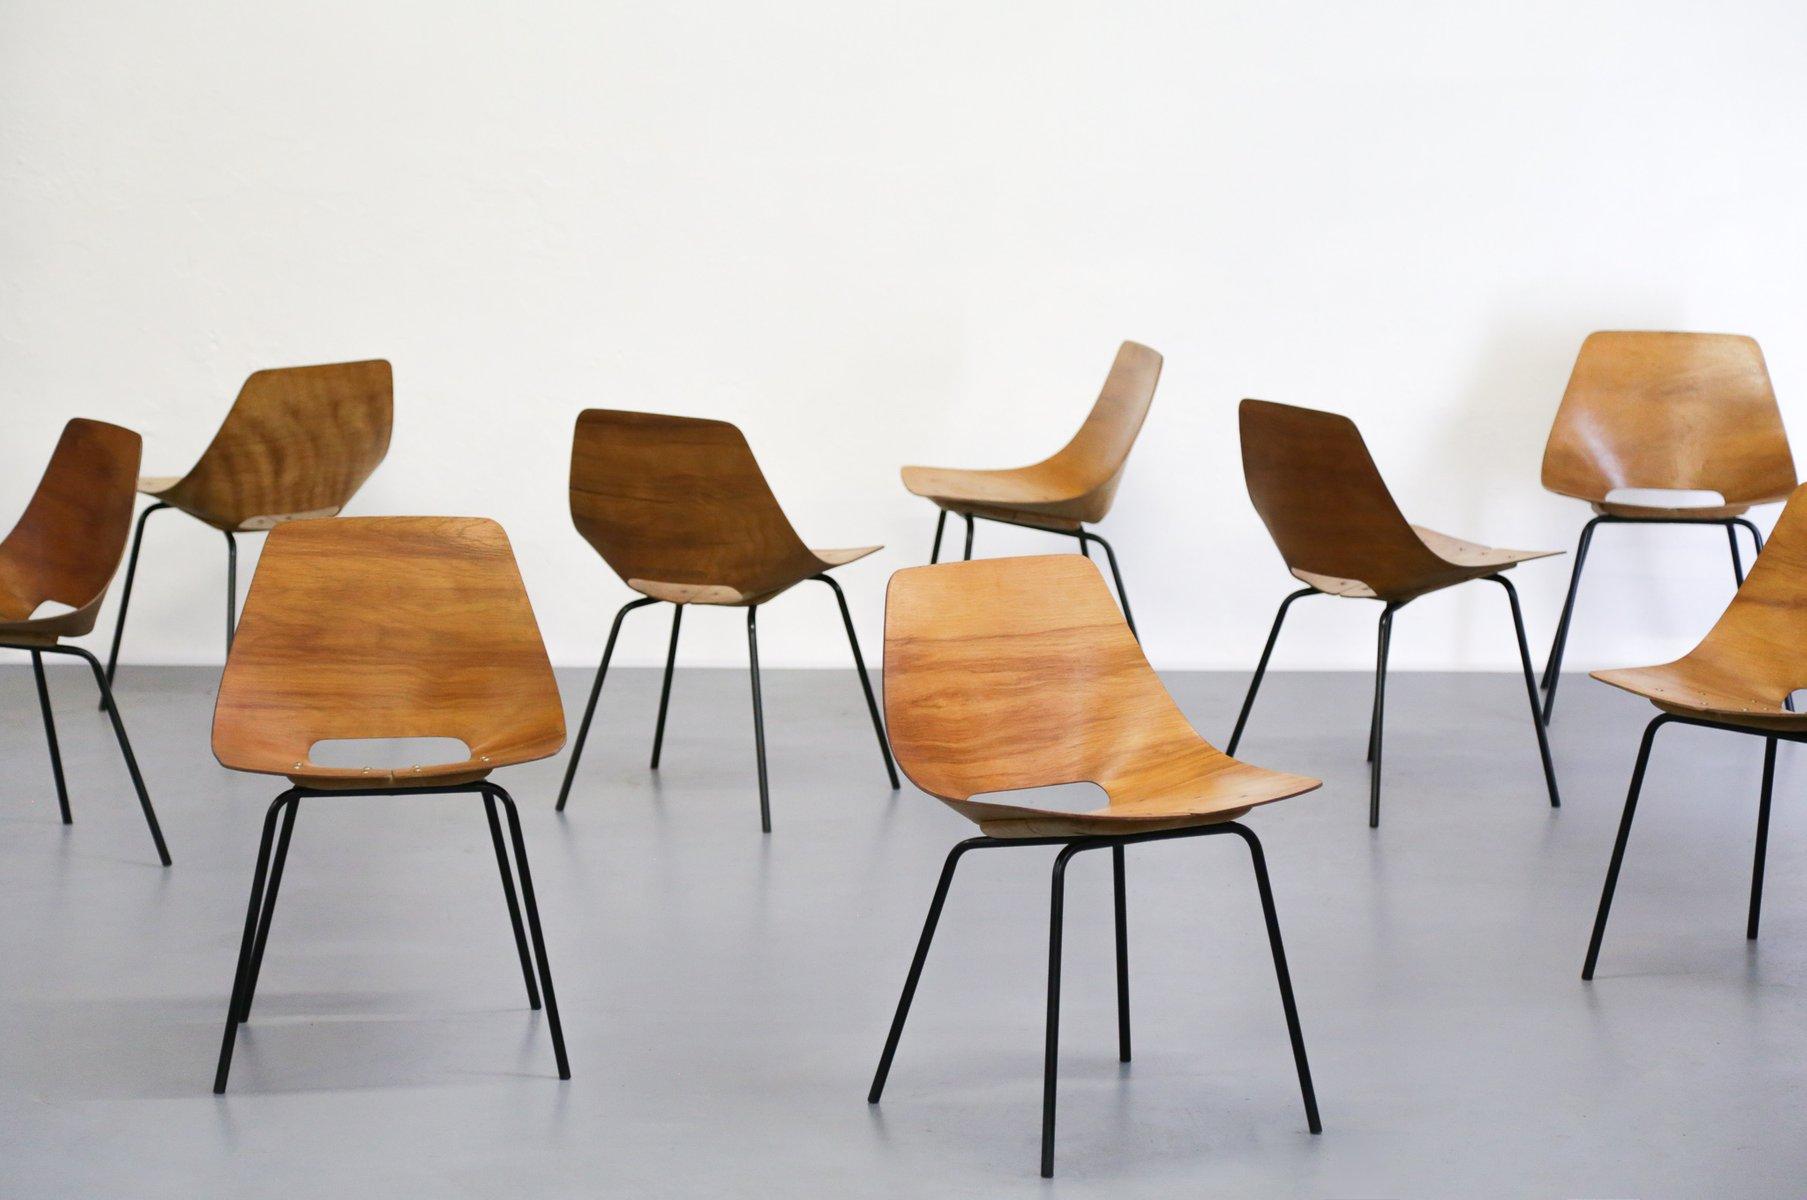 Sedie da pranzo design set di sedie tulip sala da pranzo for Sedia scandinava